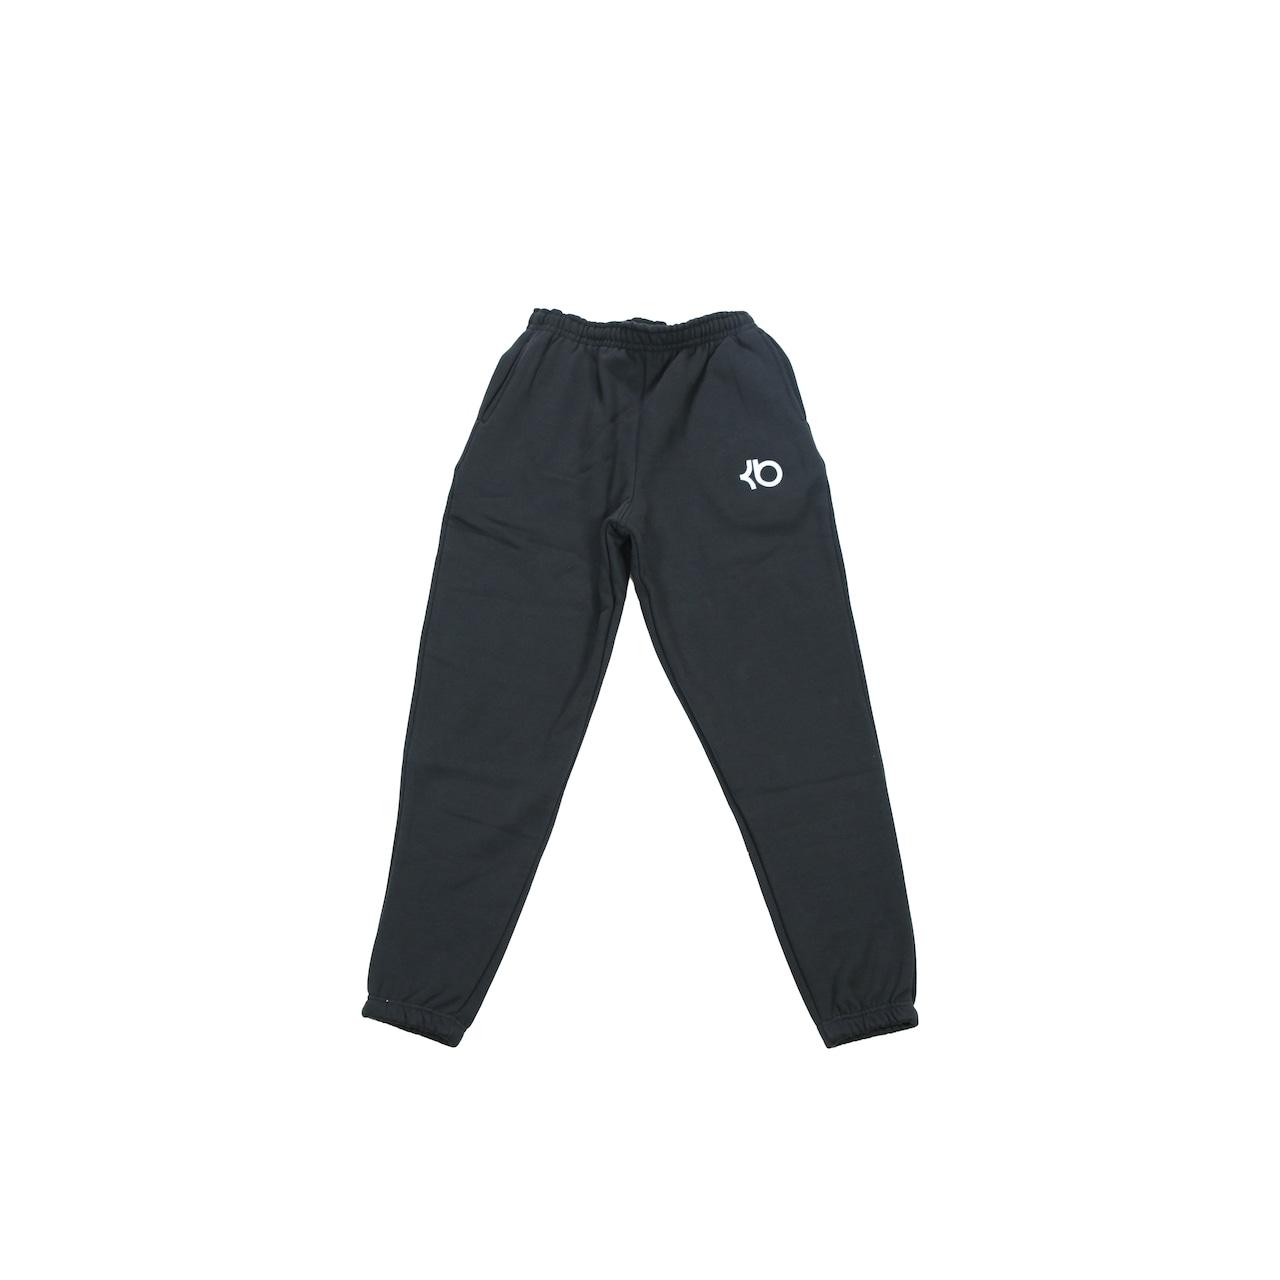 KB. HEAVYWEIGHT SWEAT PANTS [BLACK]